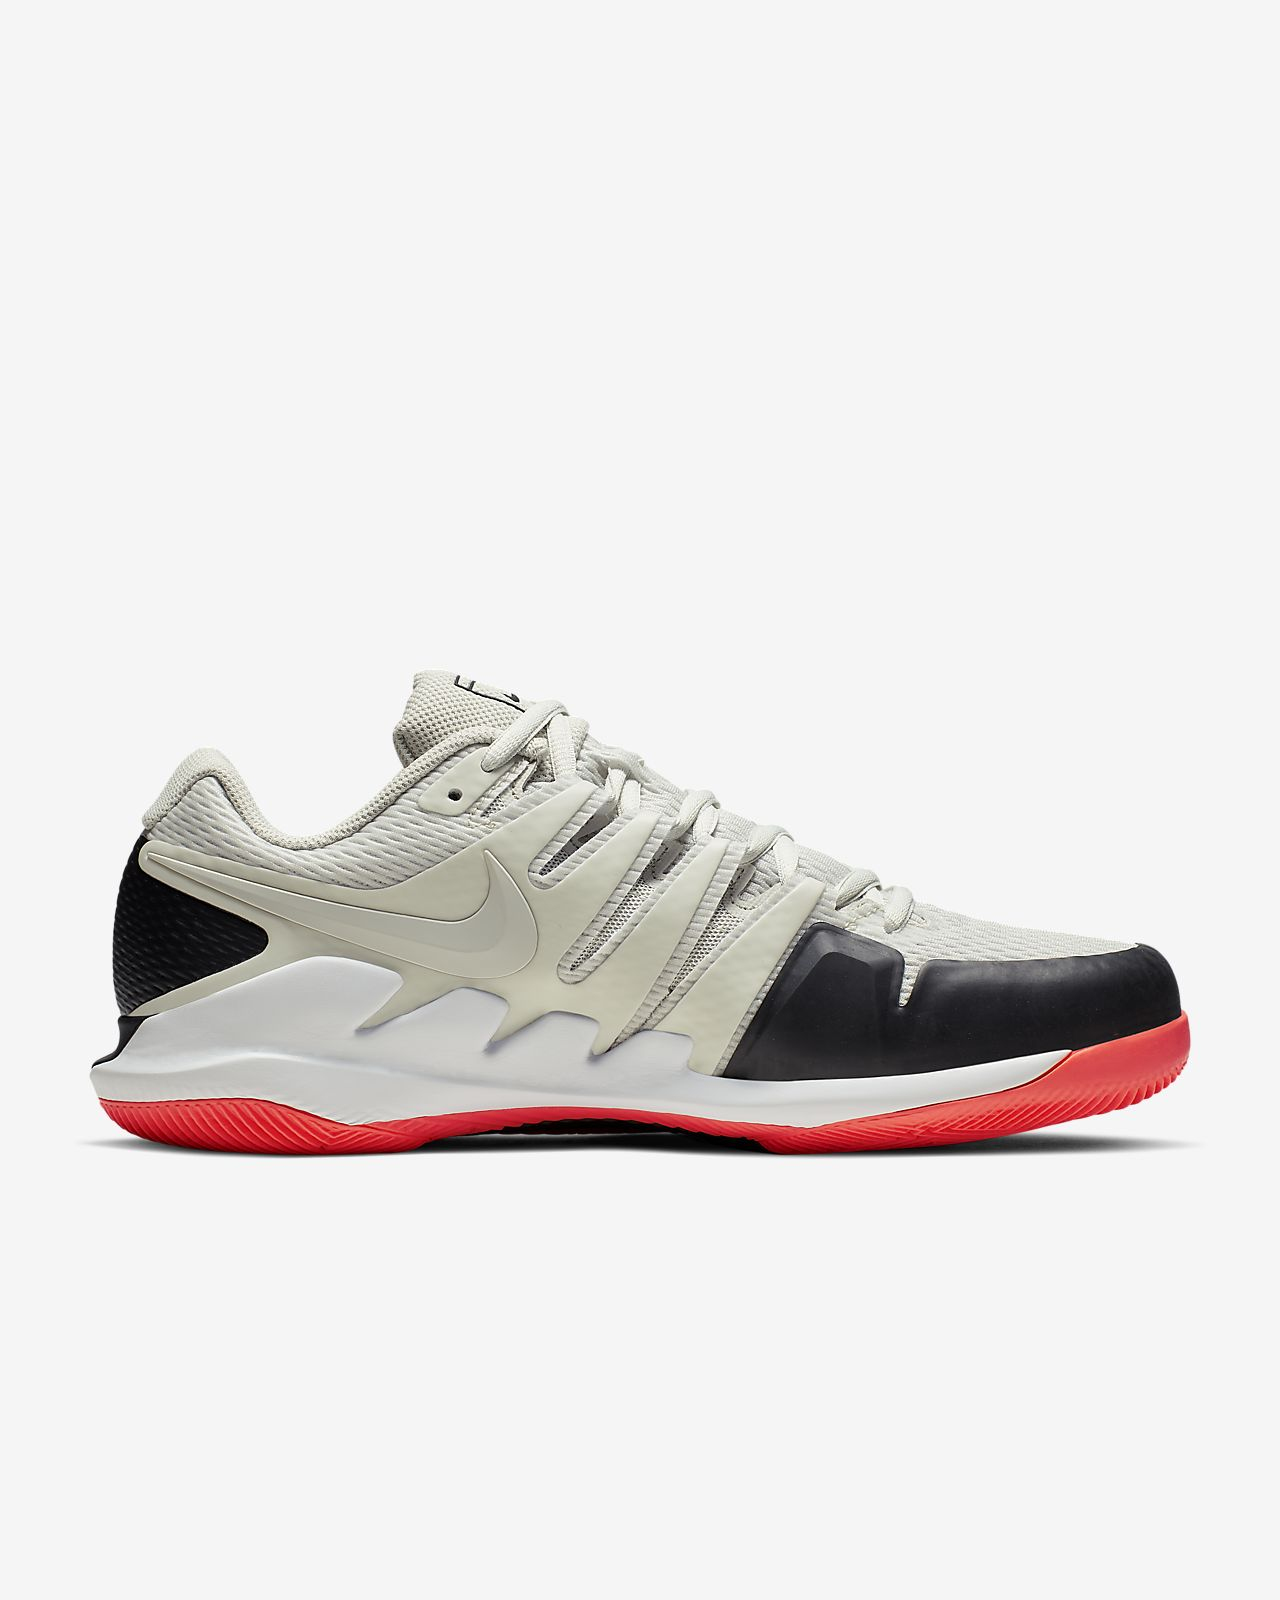 on feet images of sale online where can i buy NikeCourt Air Zoom Vapor X Herren-Tennisschuh für Hartplätze